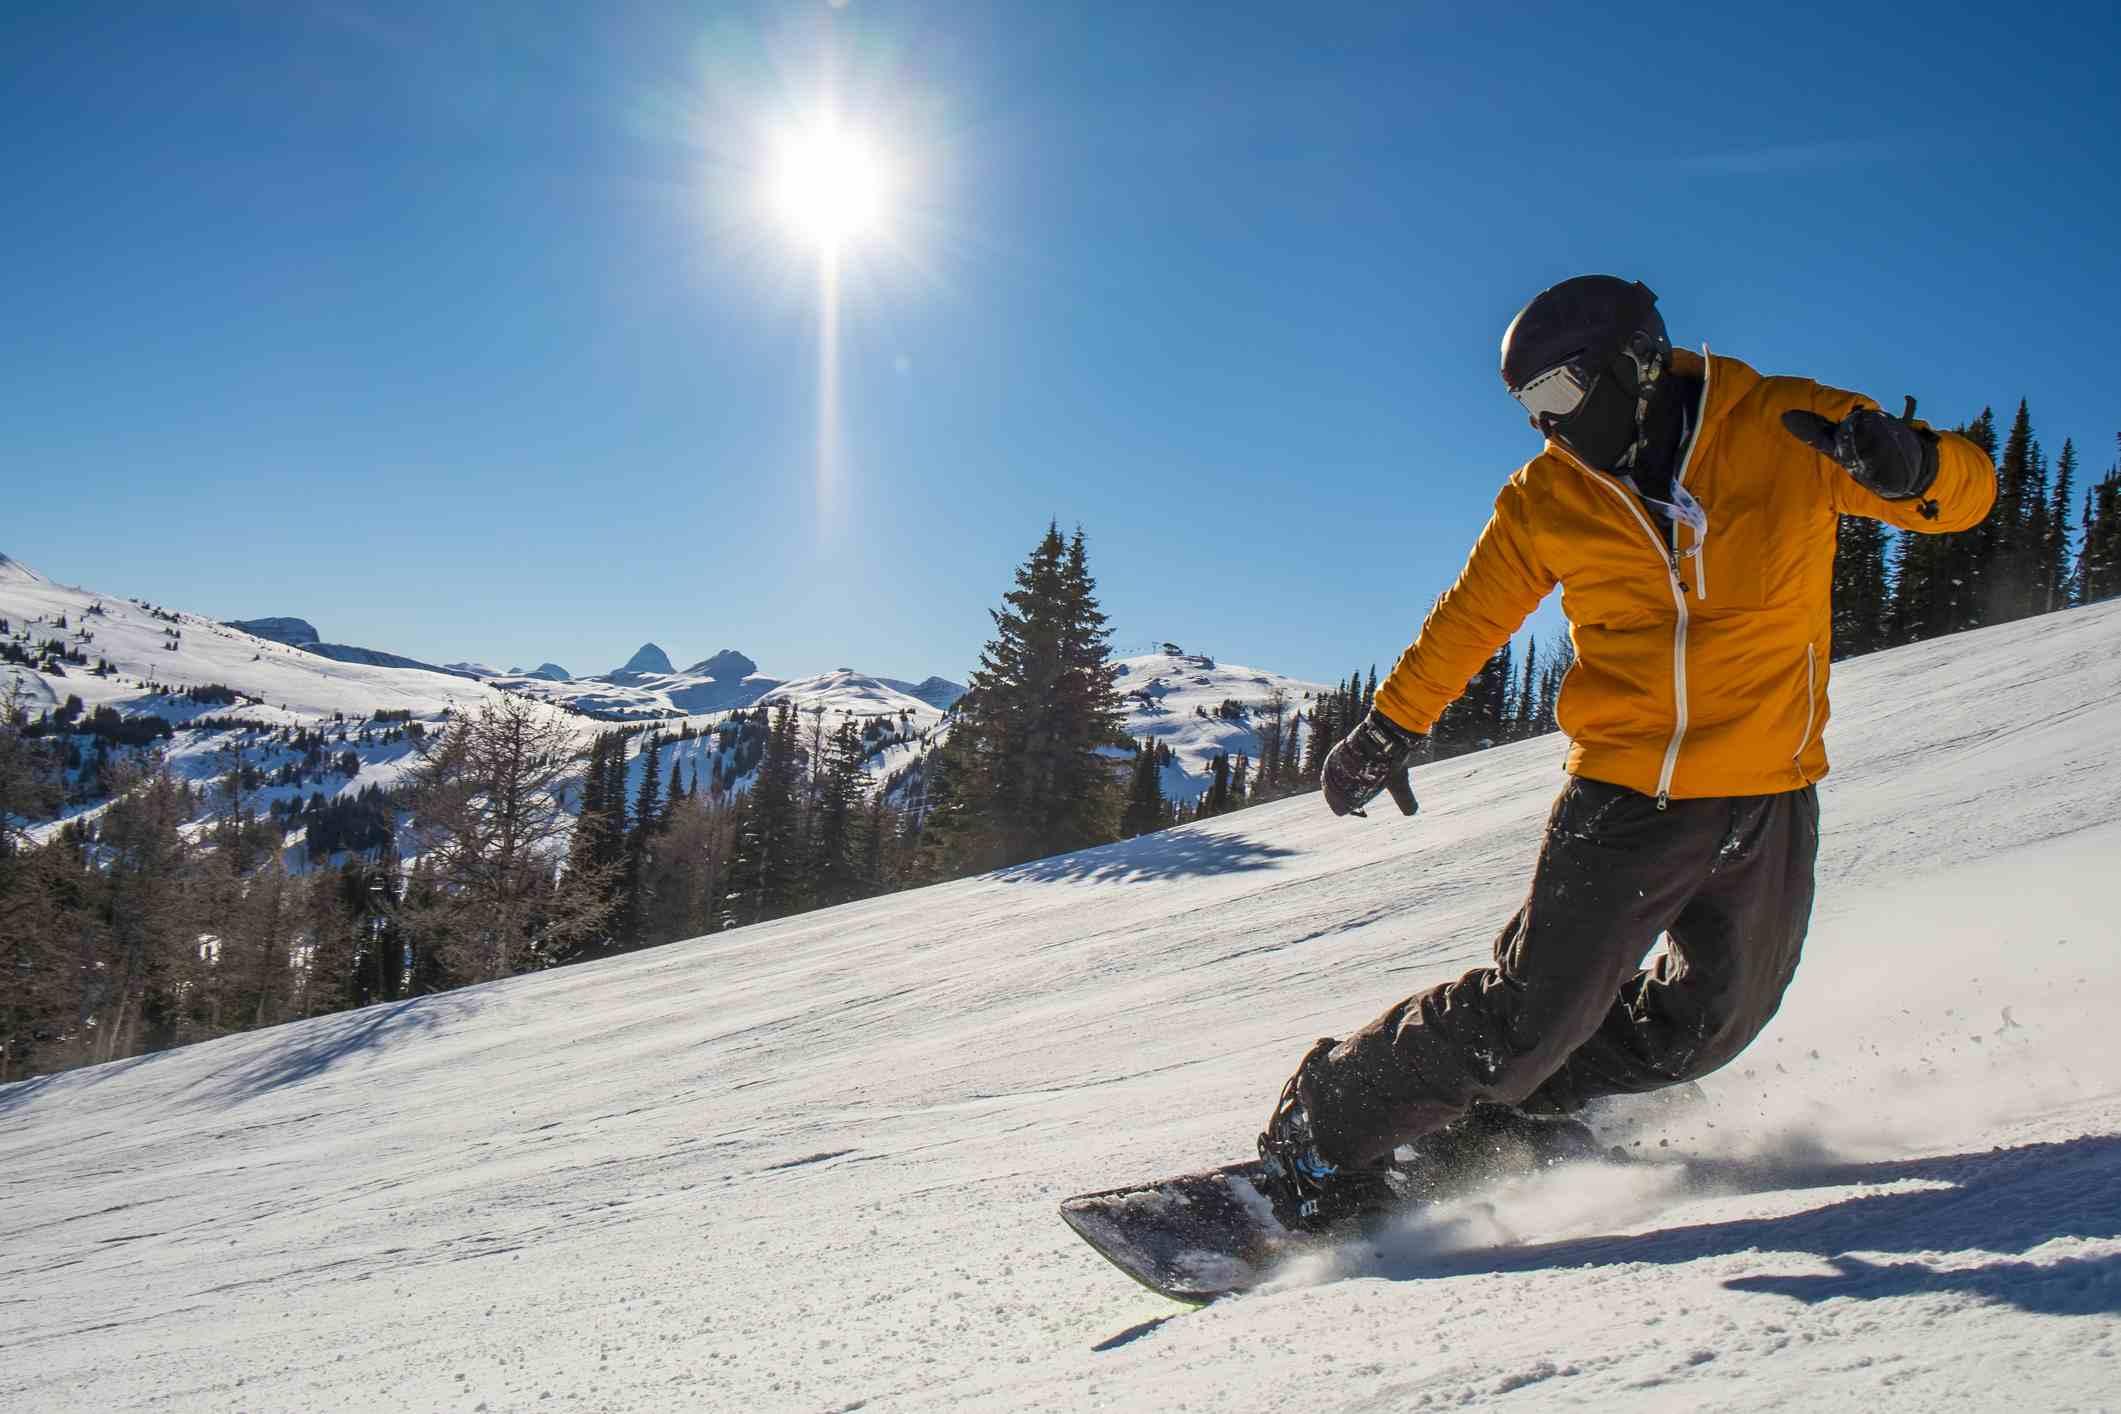 Snowboarder cranks turn on mountain slope